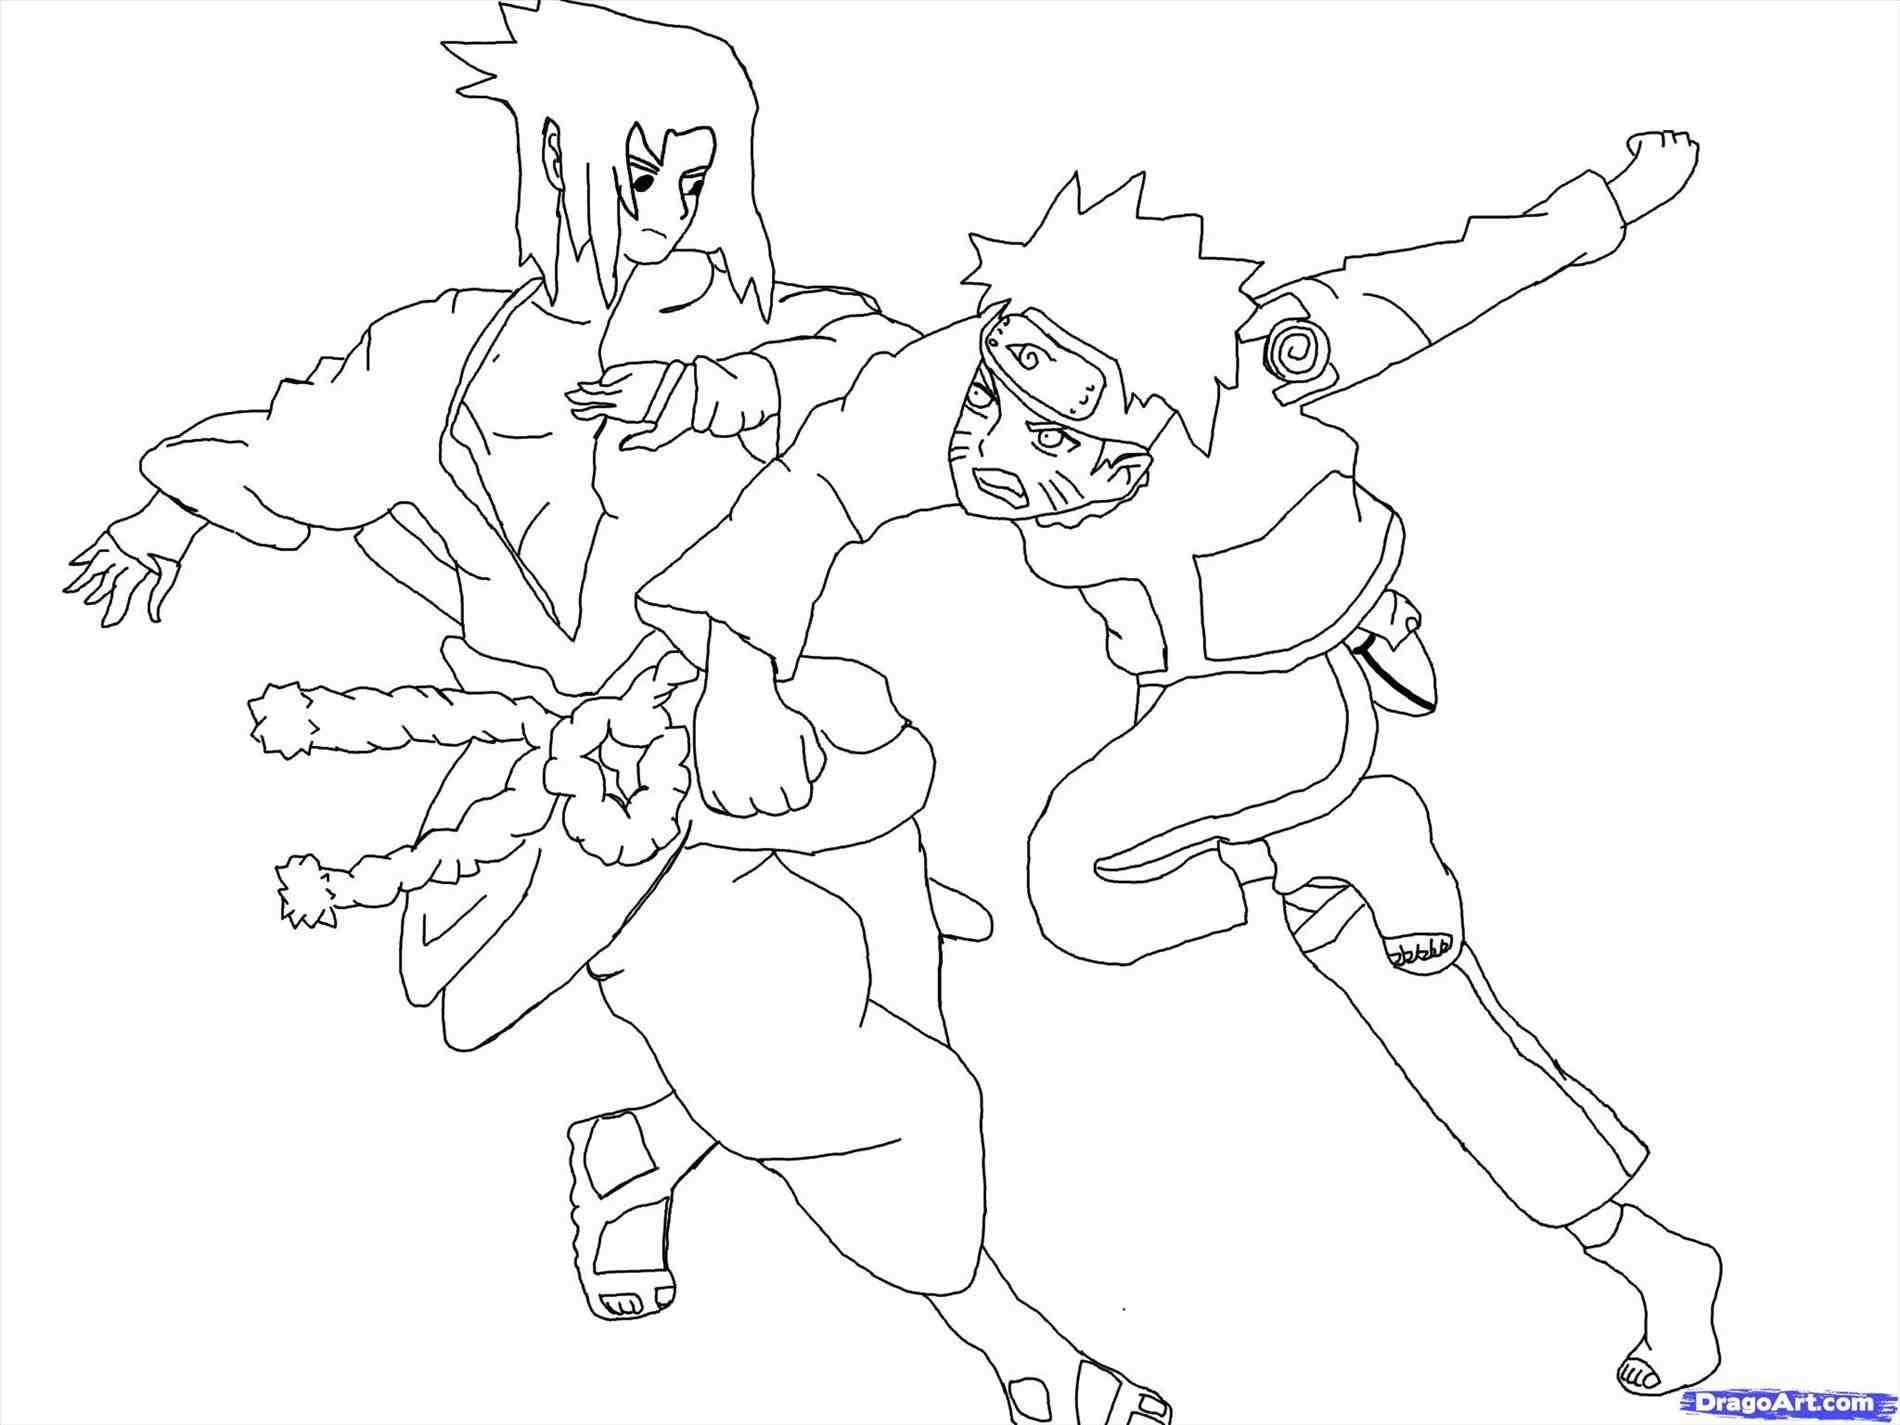 1900x1425 Naruto Vs Sasuke Drawing Color Drinkeats.club